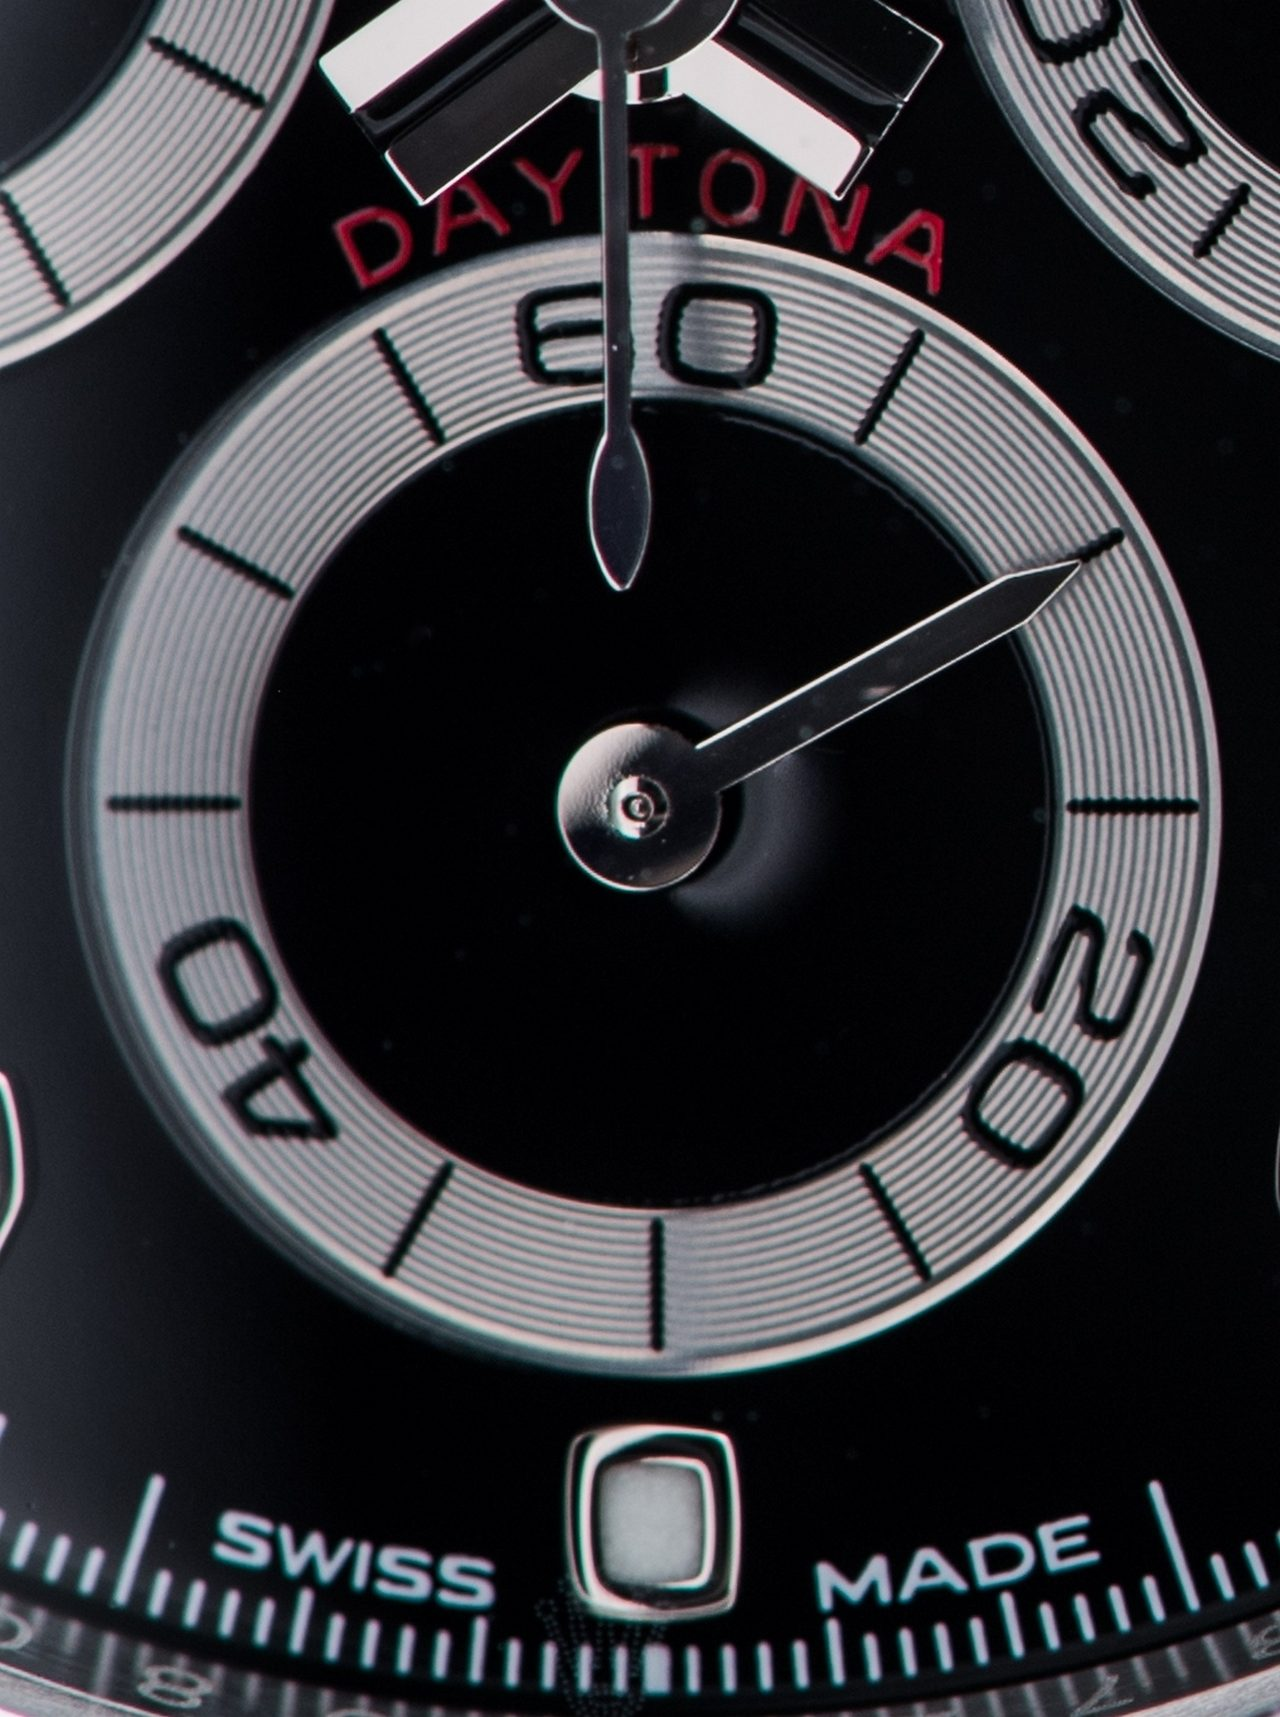 watch-test-rolex-daytona-116500ln-acciaio-con-lunetta-in-cerachrom-nera-prezzo-price_0-10023